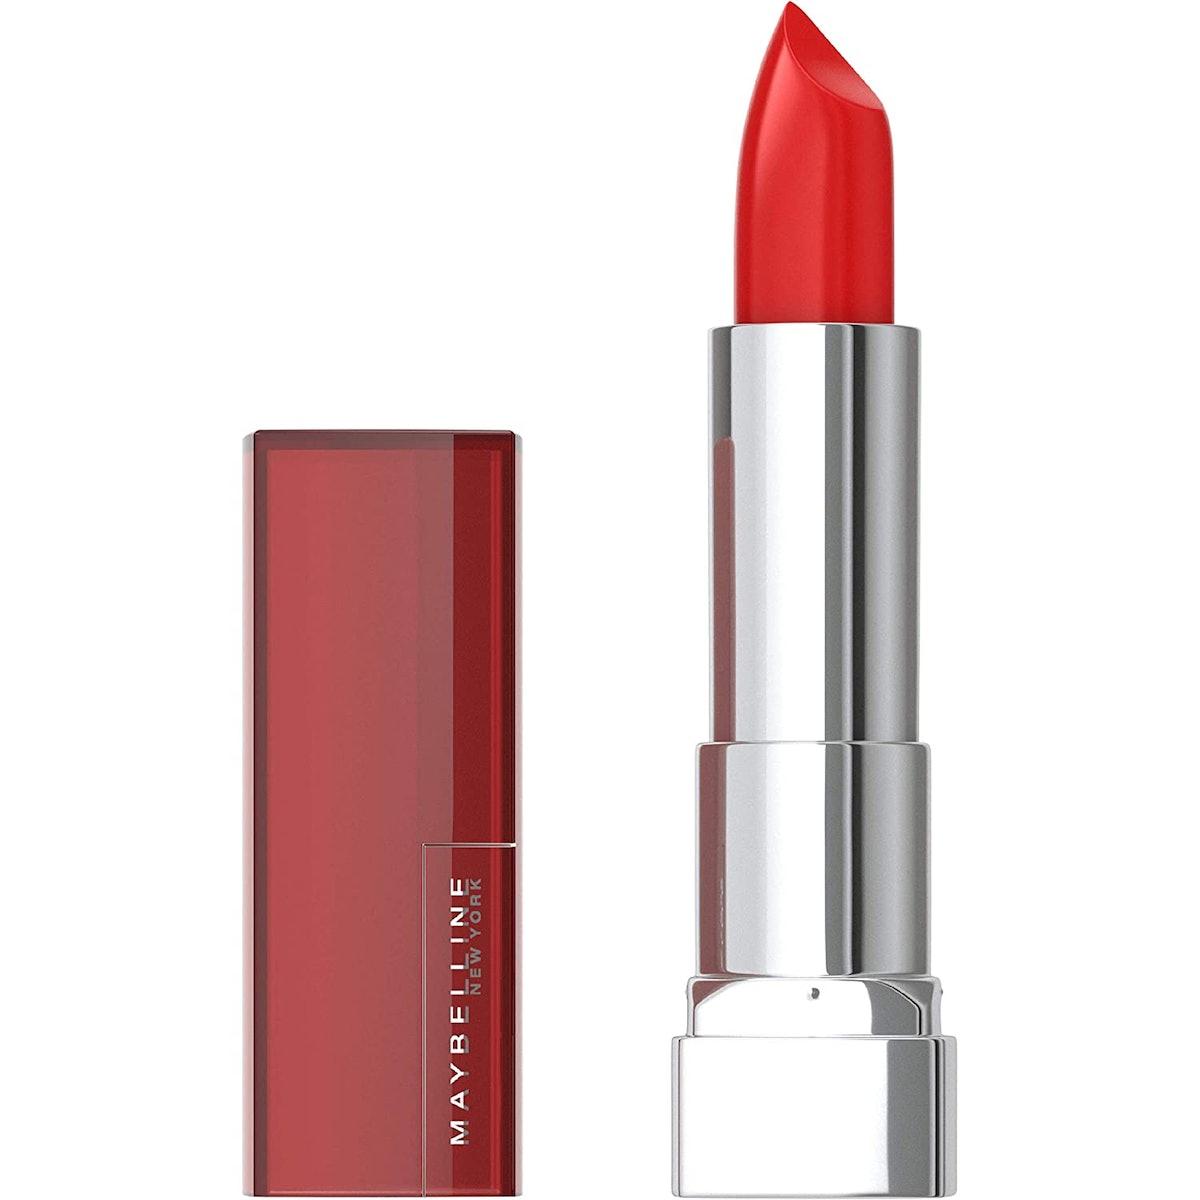 Maybelline Color Sensational Lipstick in Red Revival